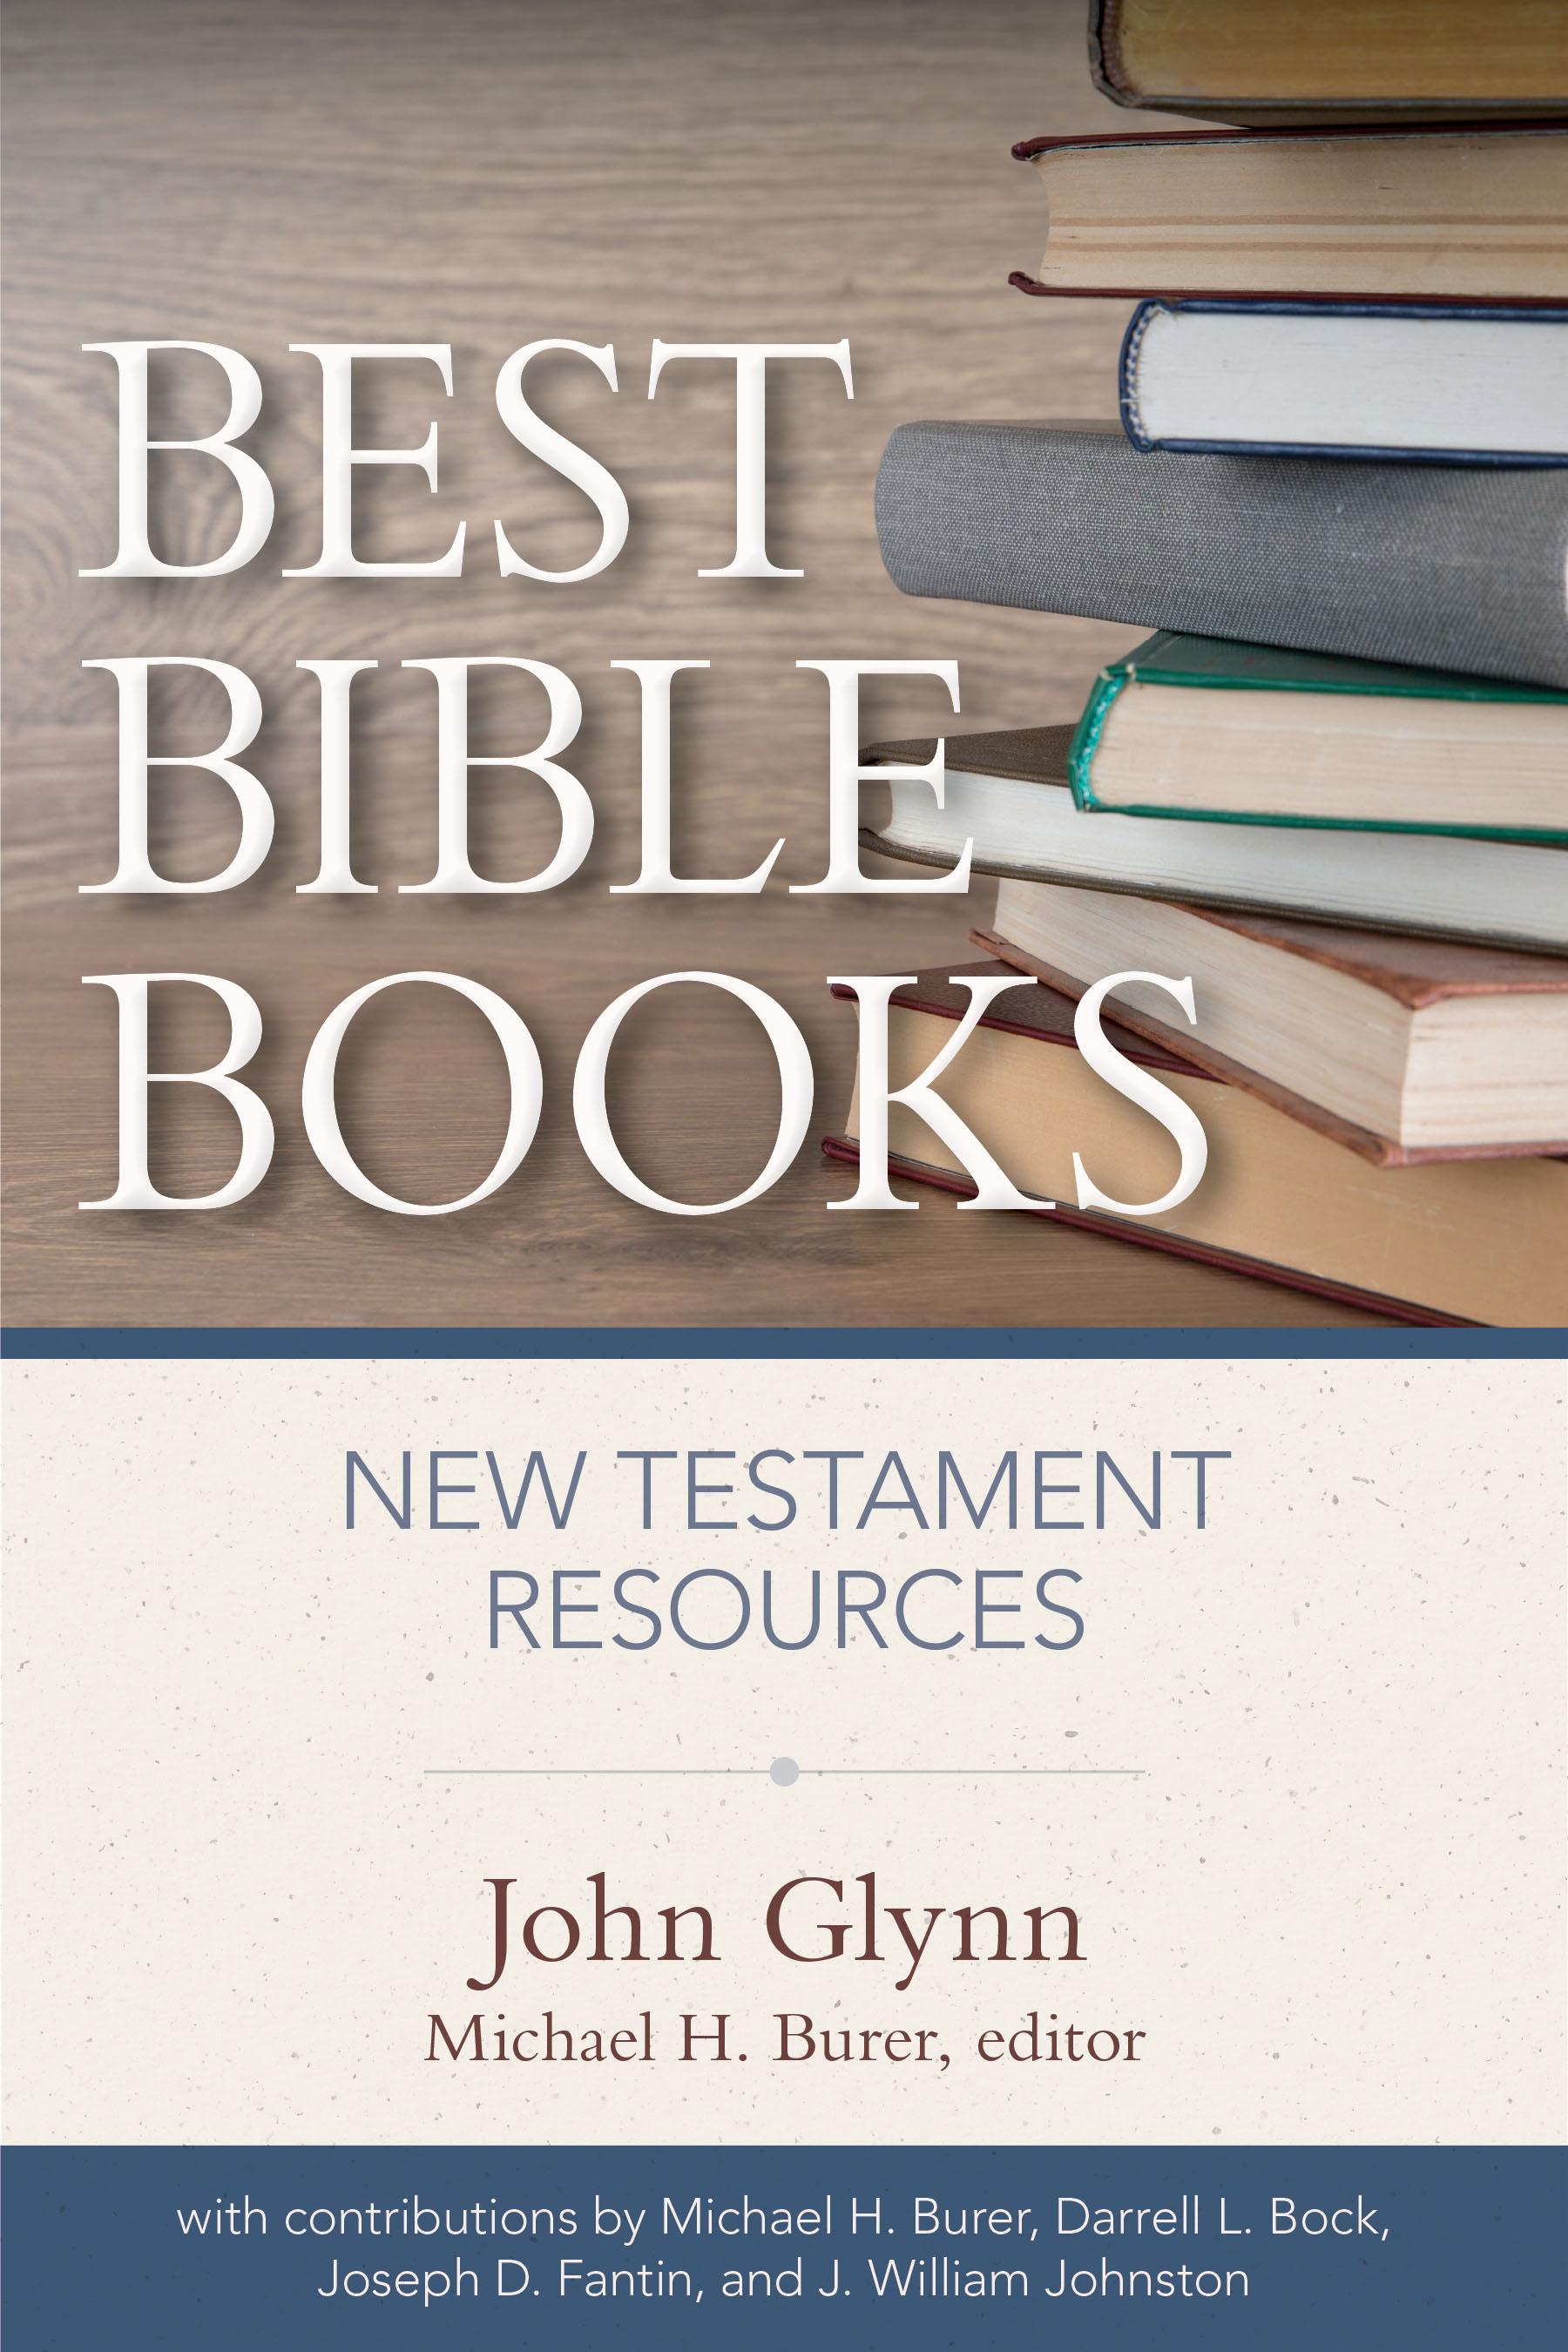 Best Bible Books